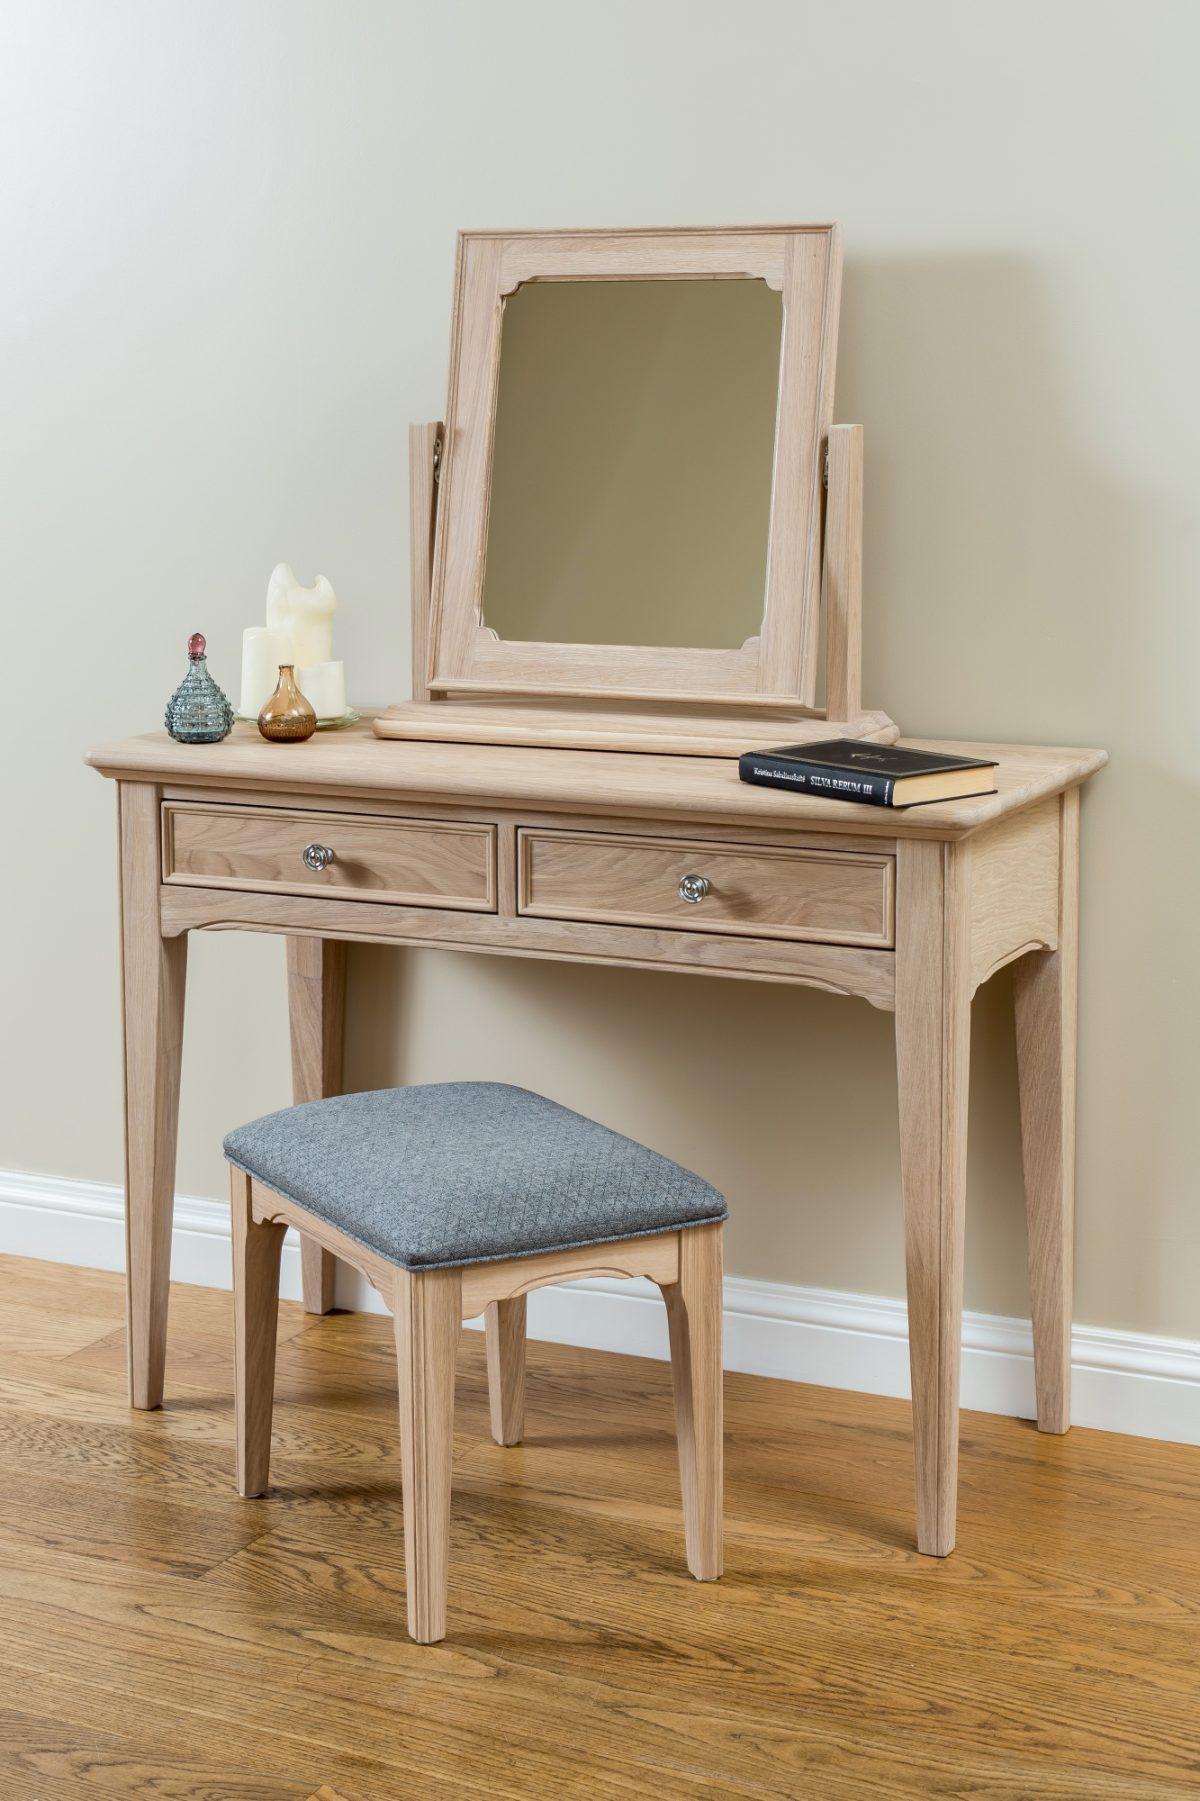 NE dressing table stool